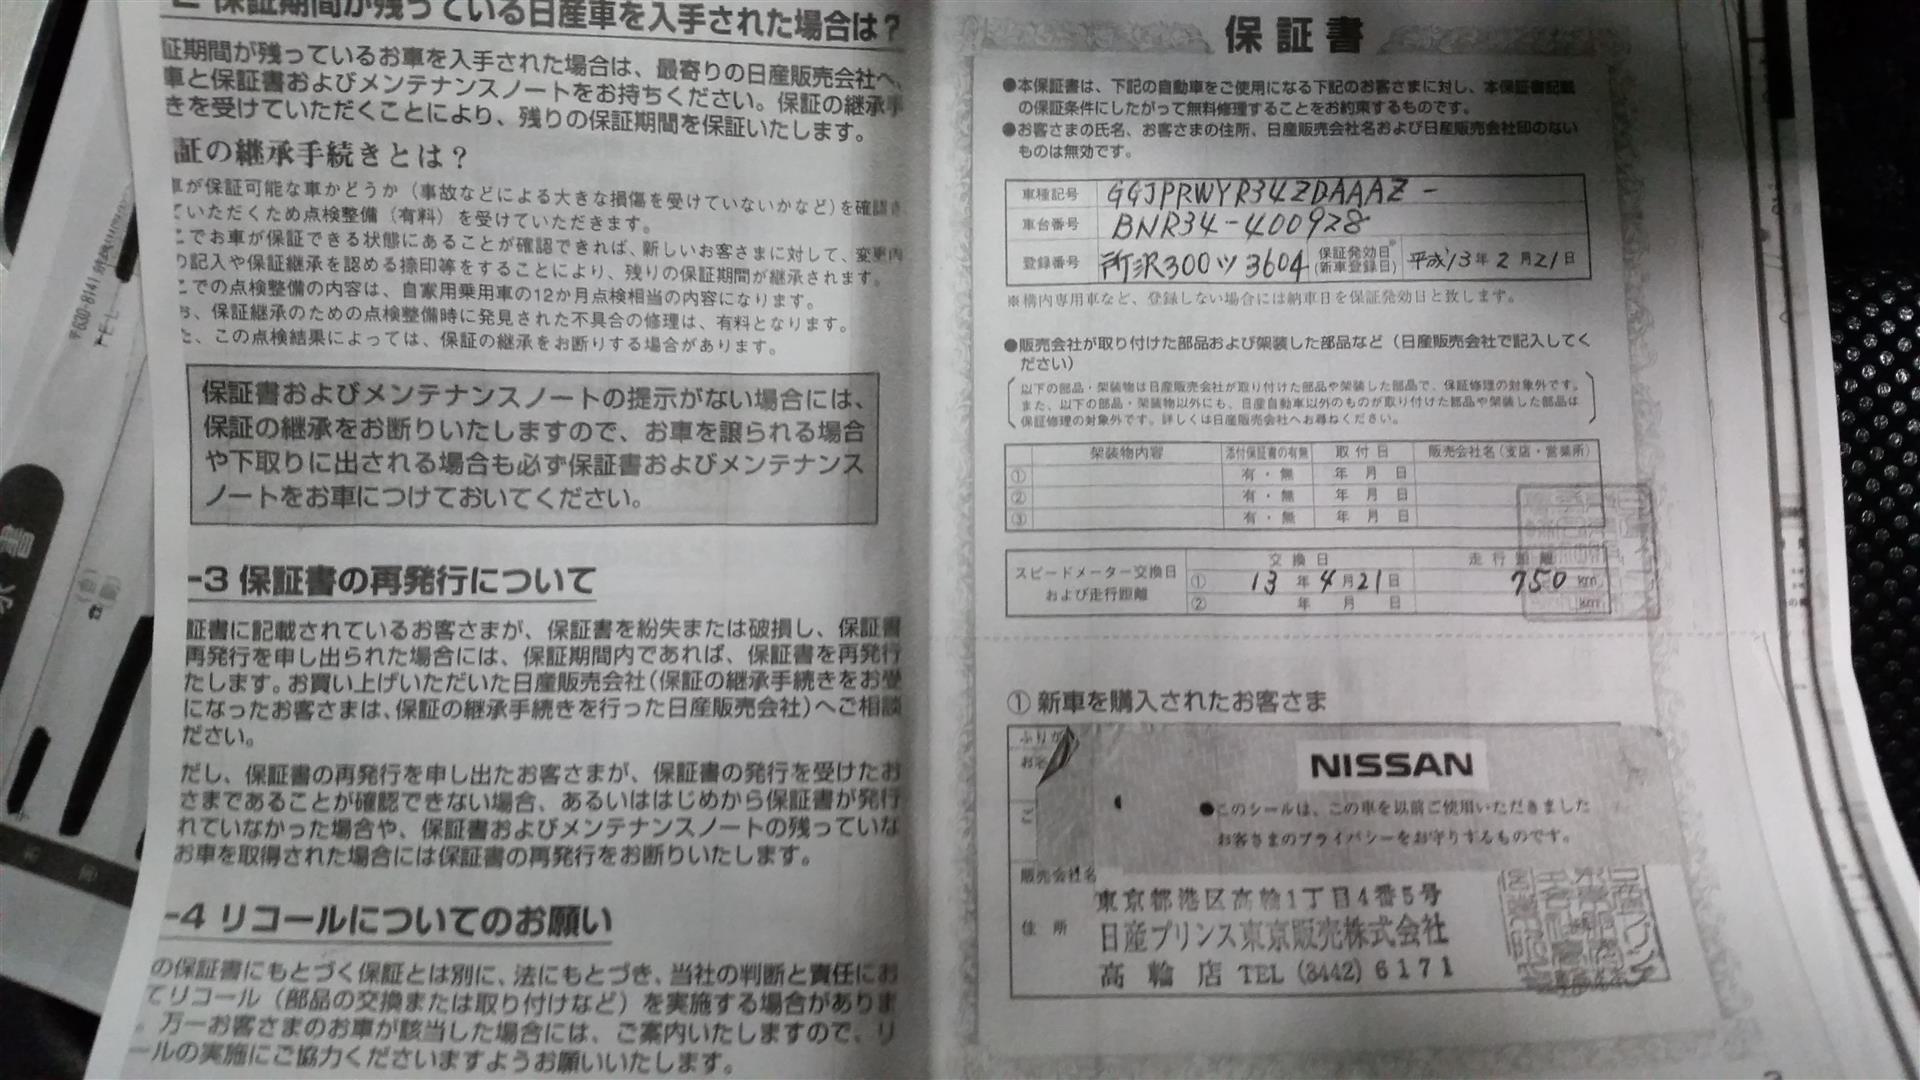 2001 Nissan Skyline R34 GTR VSpec2 8